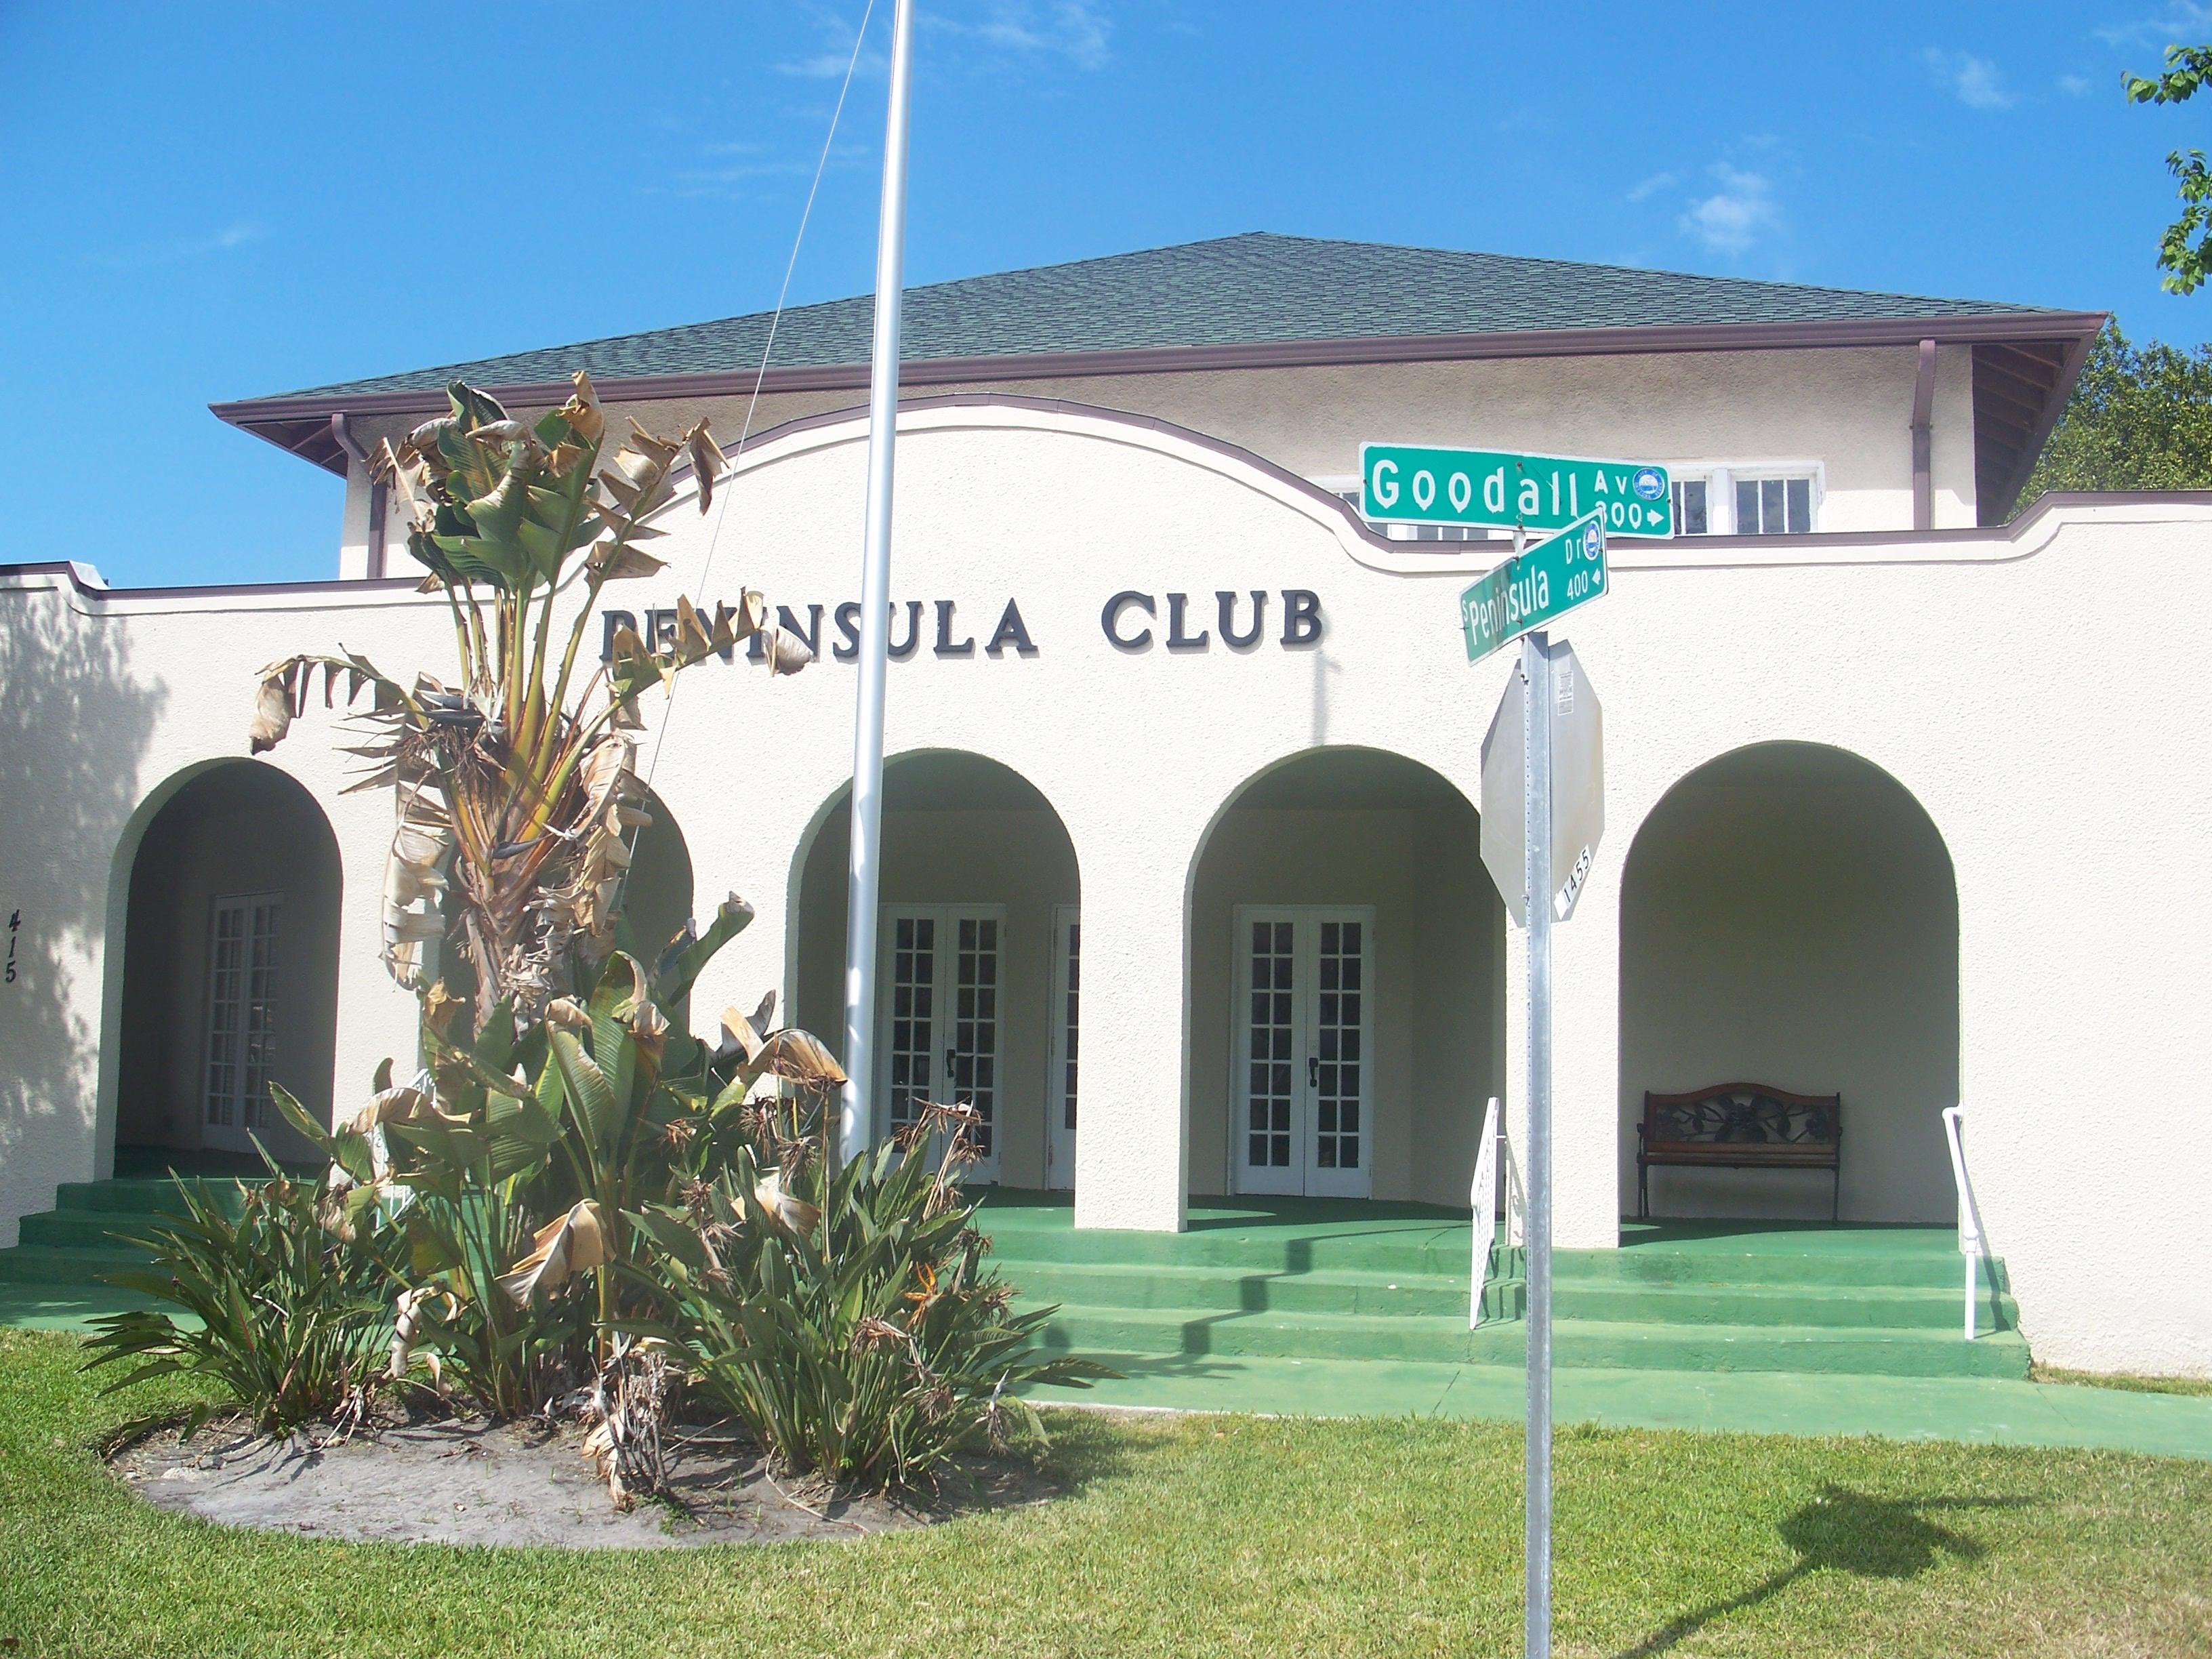 Peninsula Club Daytona Beach Fl